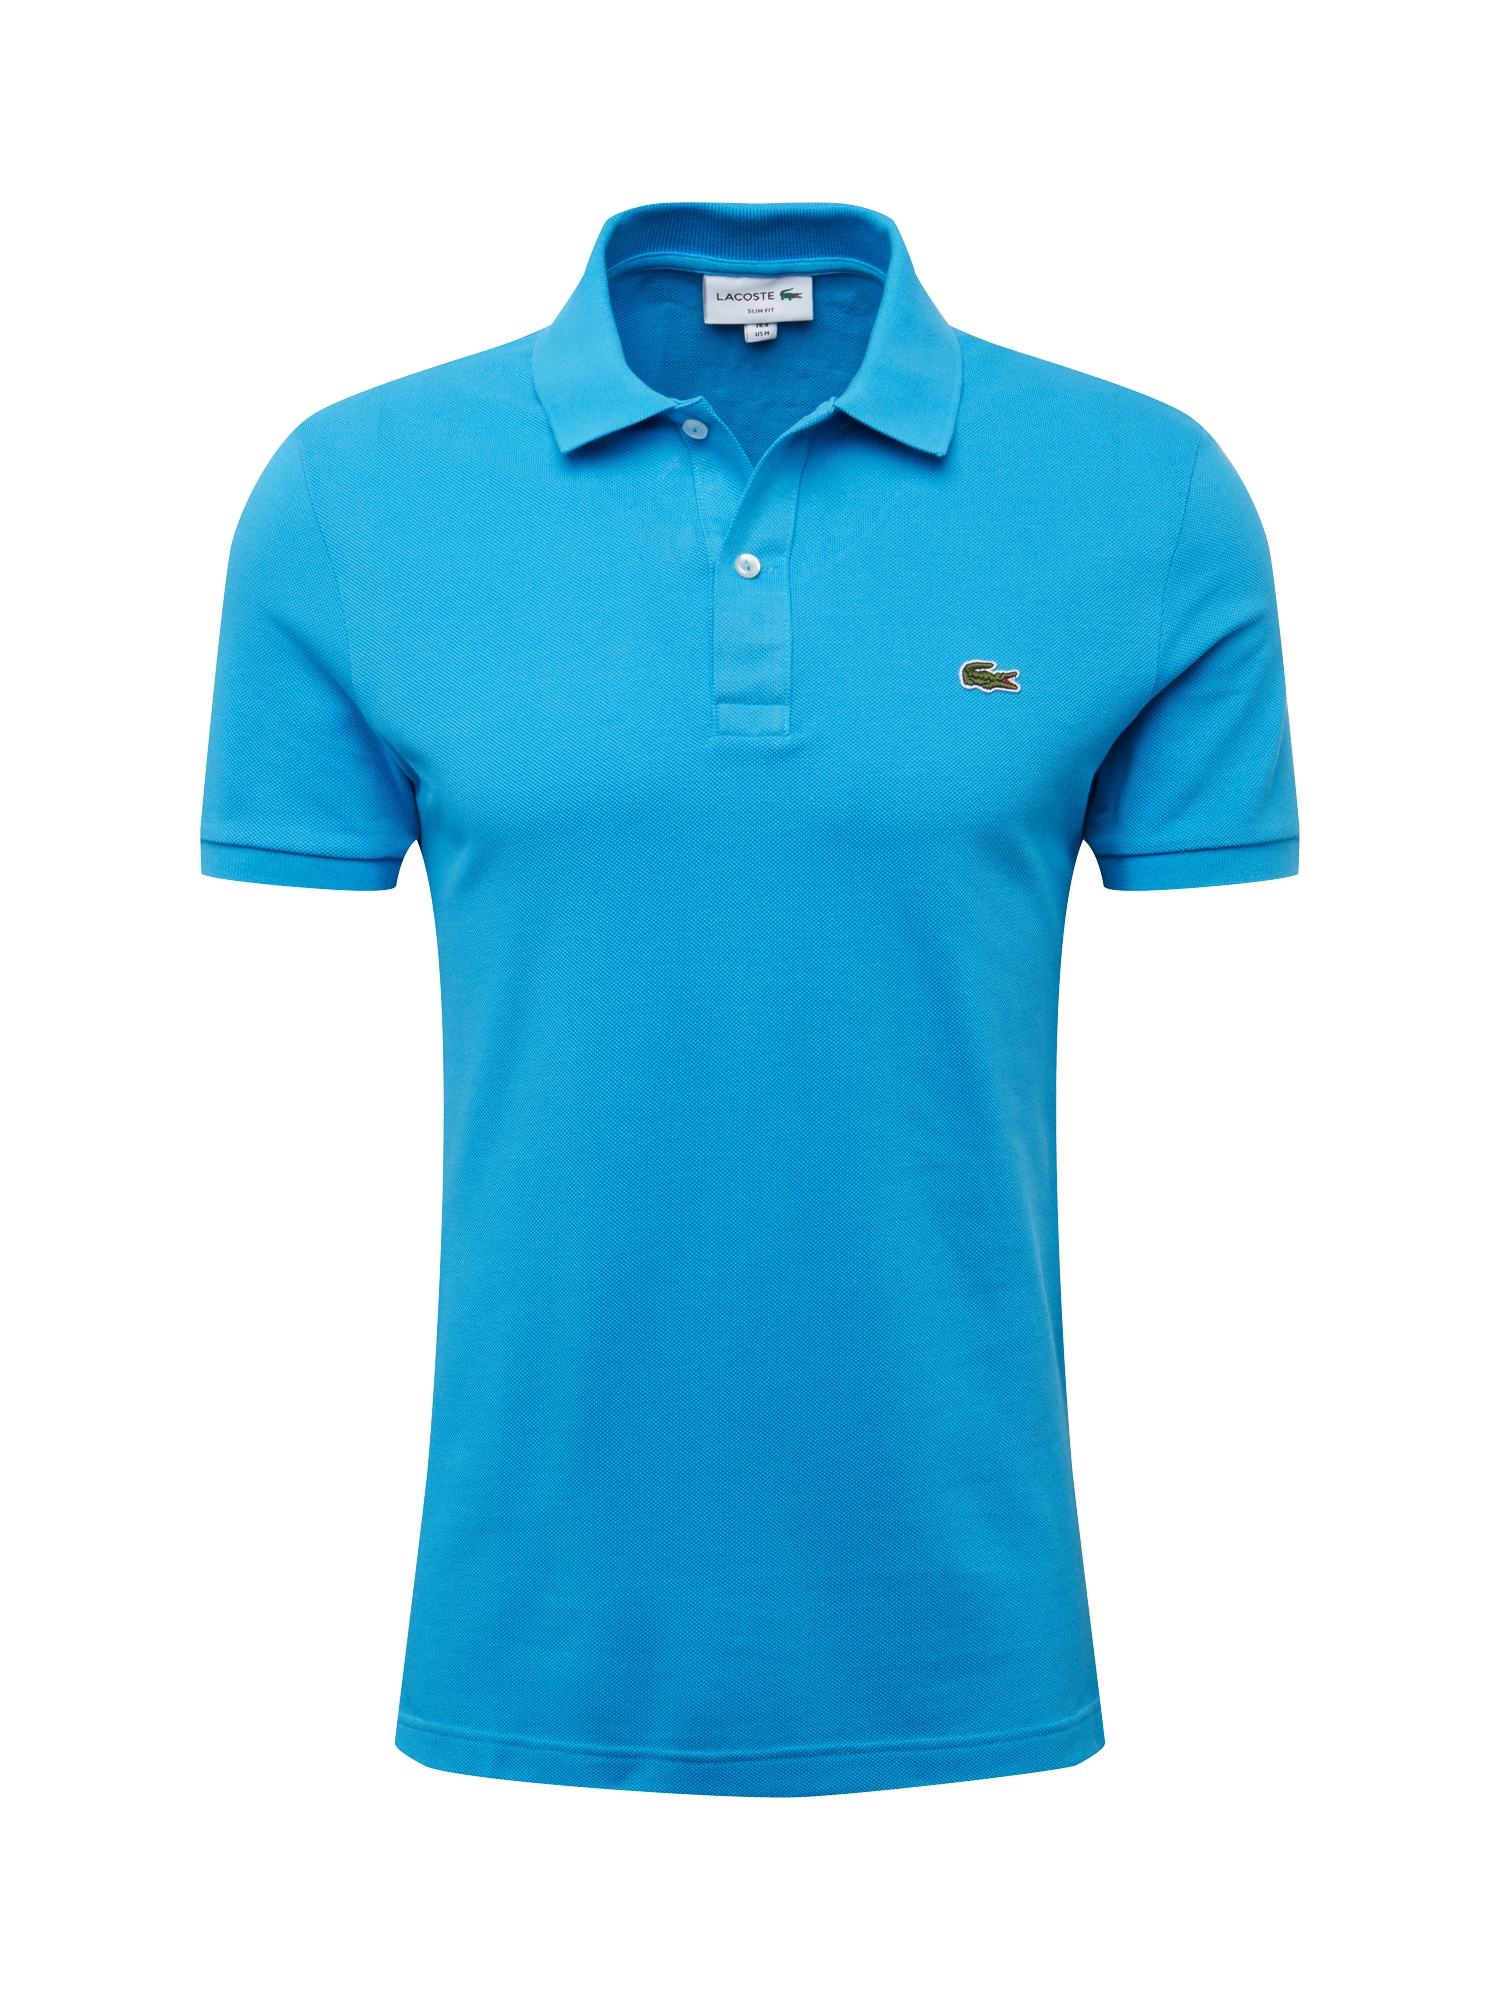 LACOSTE Marškinėliai mėlyna